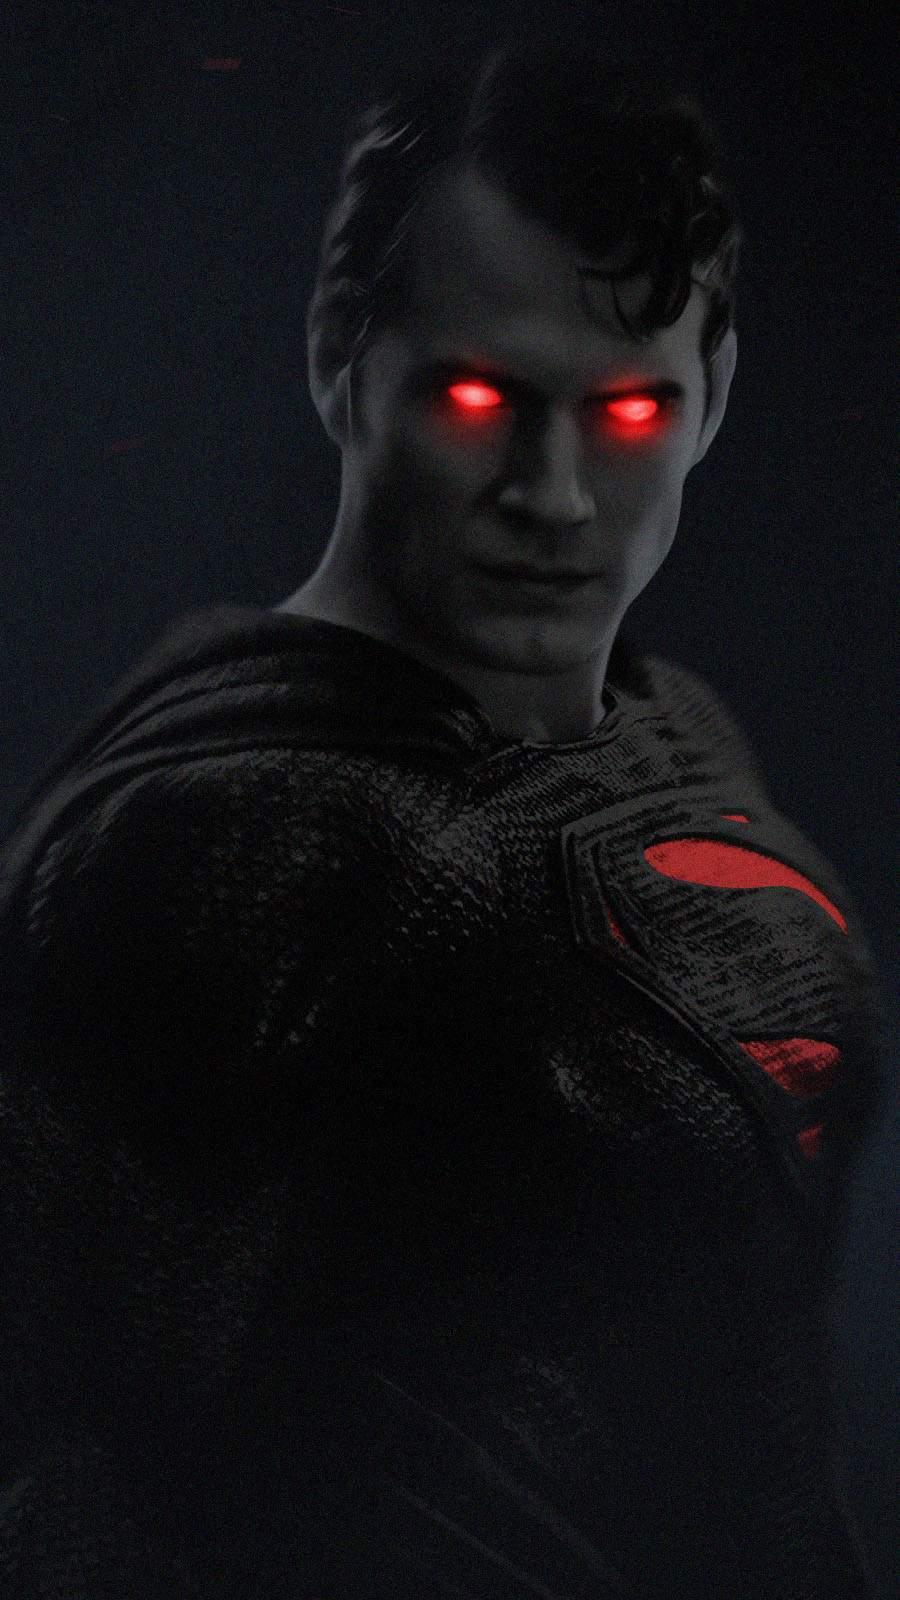 Superman Black Suit iPhone Wallpaper